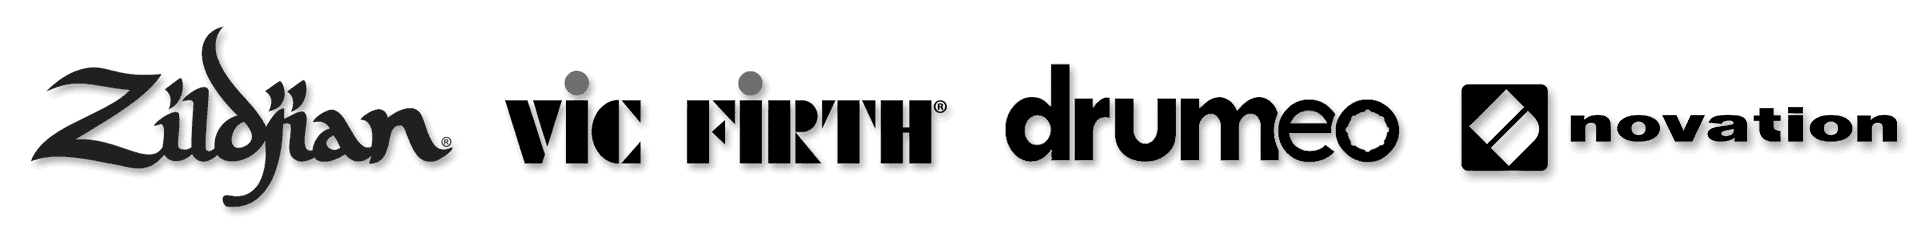 Z-F-D-N-logos